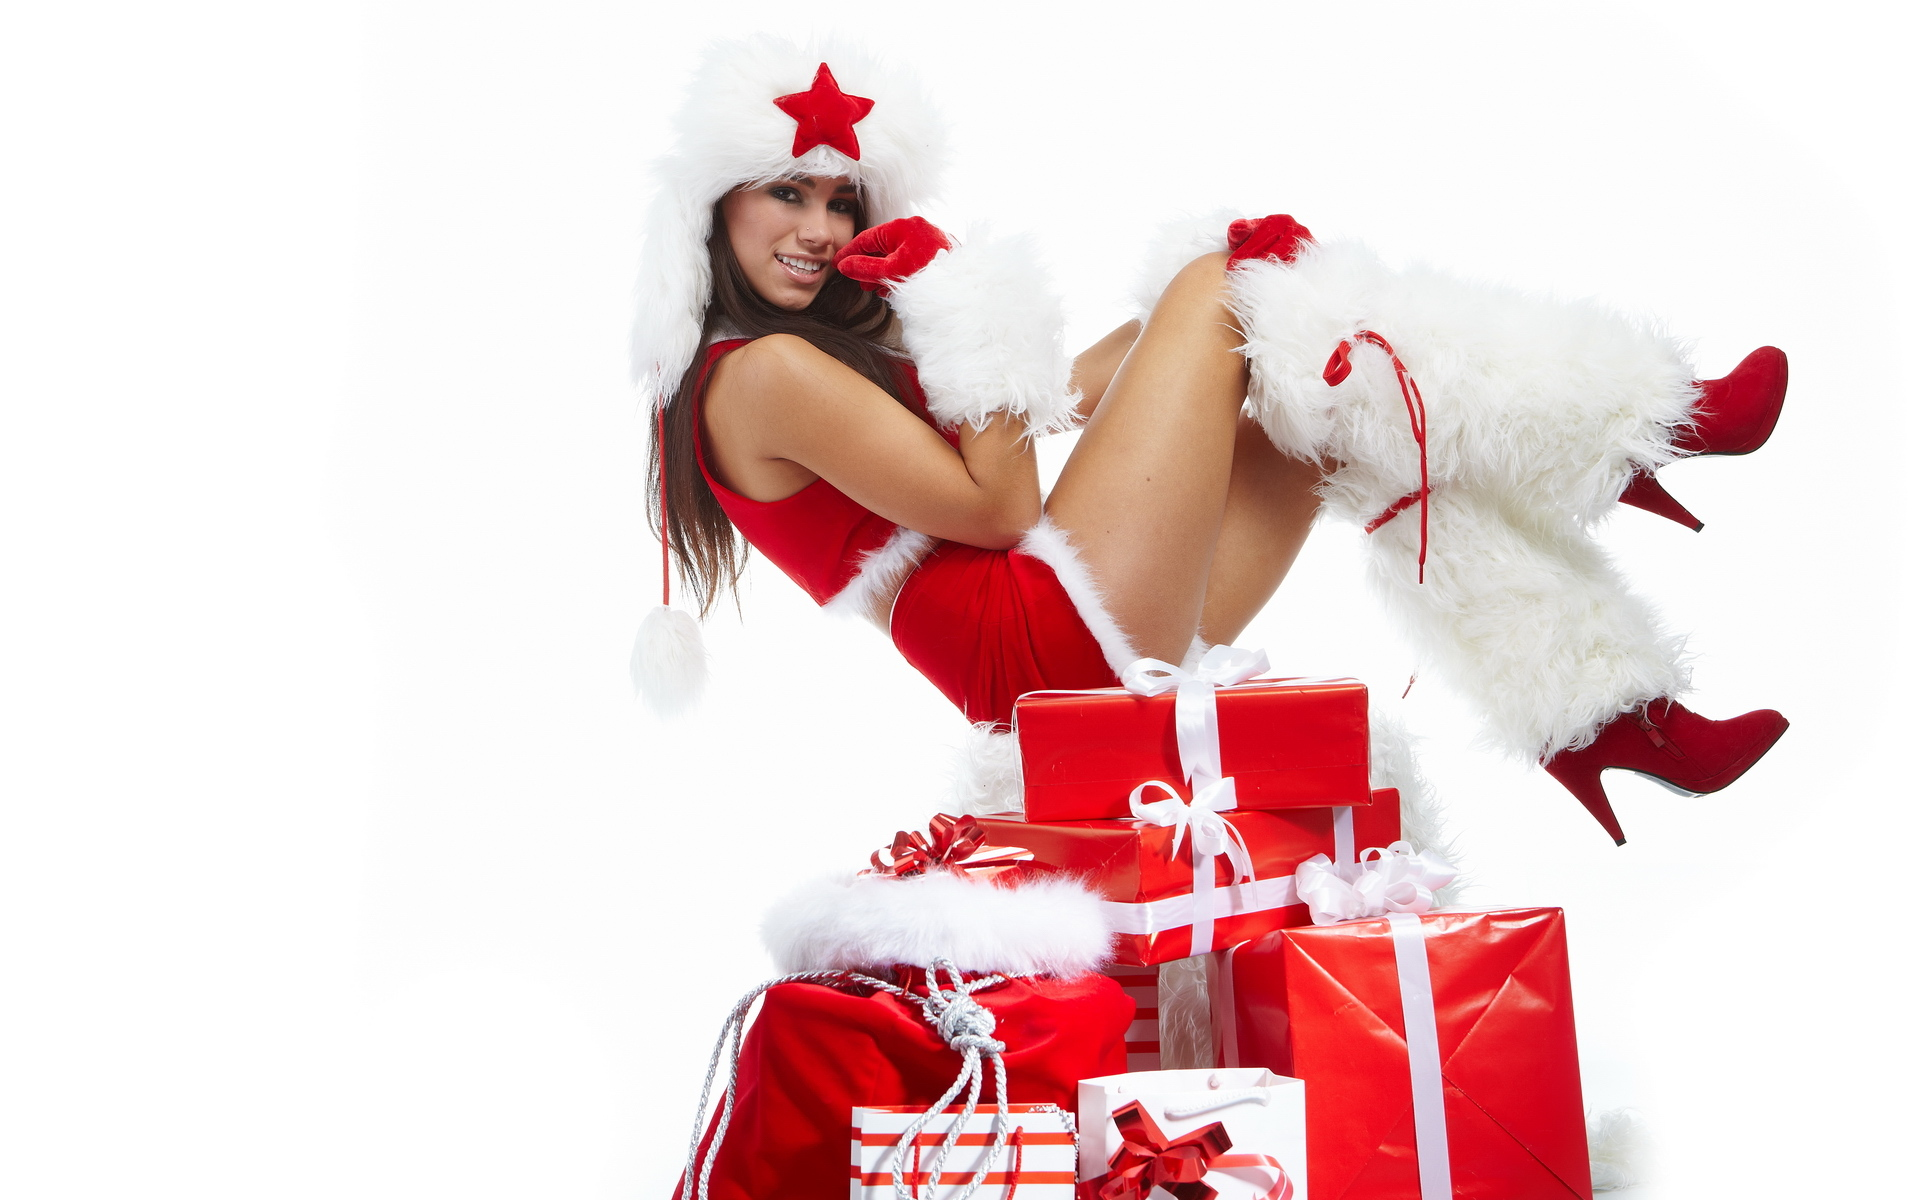 Hot christmas girls, raveena tandon hot pussy